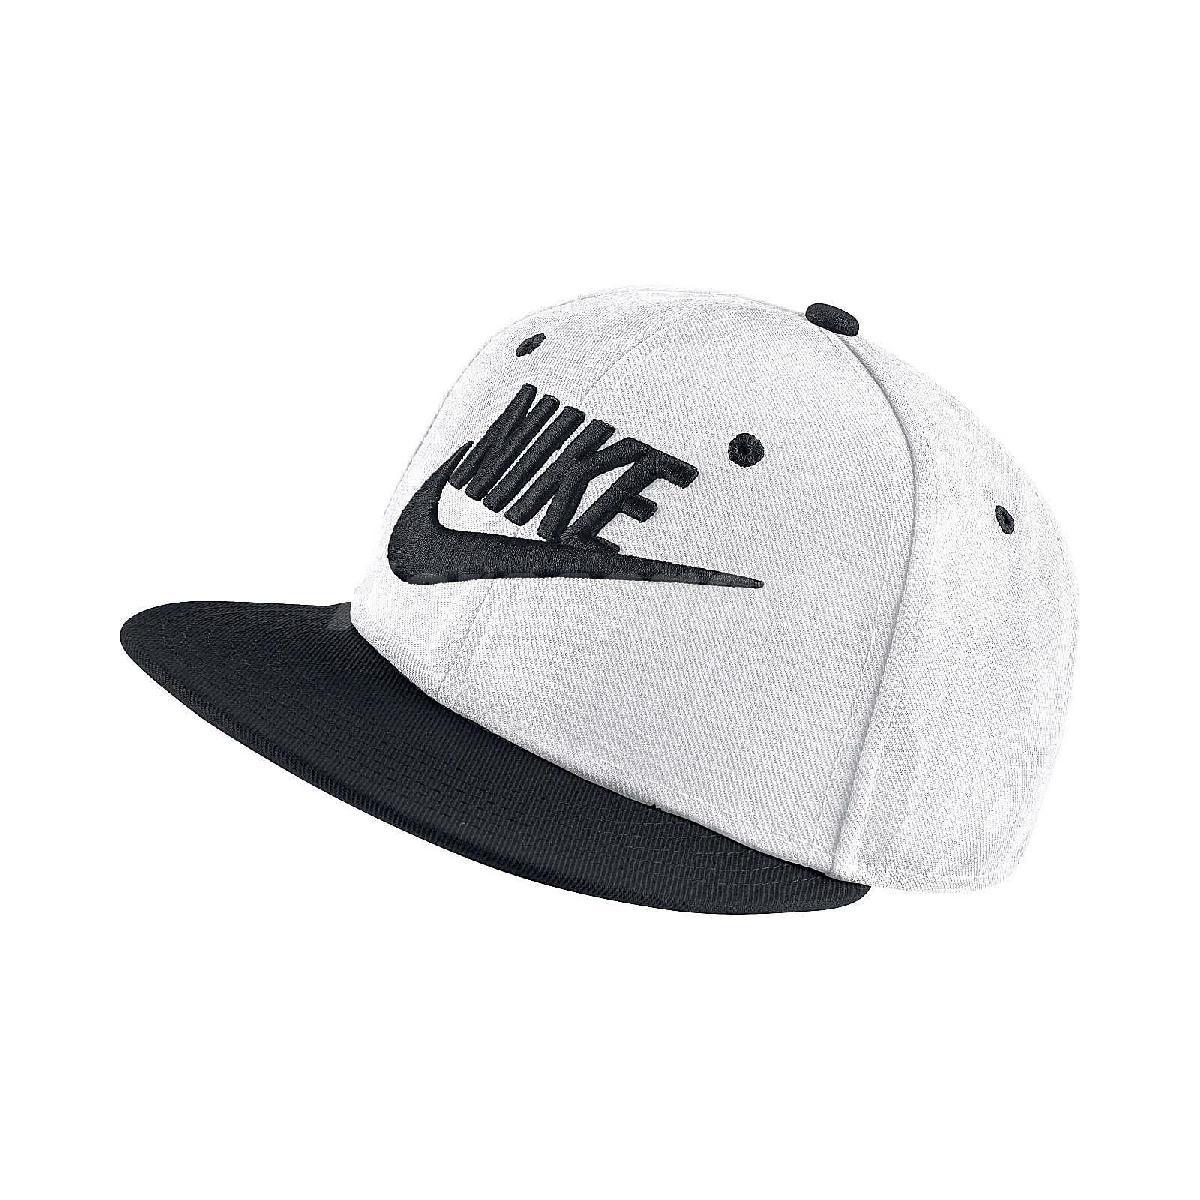 Nike 帽子 True Cap Futura 基本款 白 黑 男女款 可調式 棒球帽【PUMP306】 614590-101